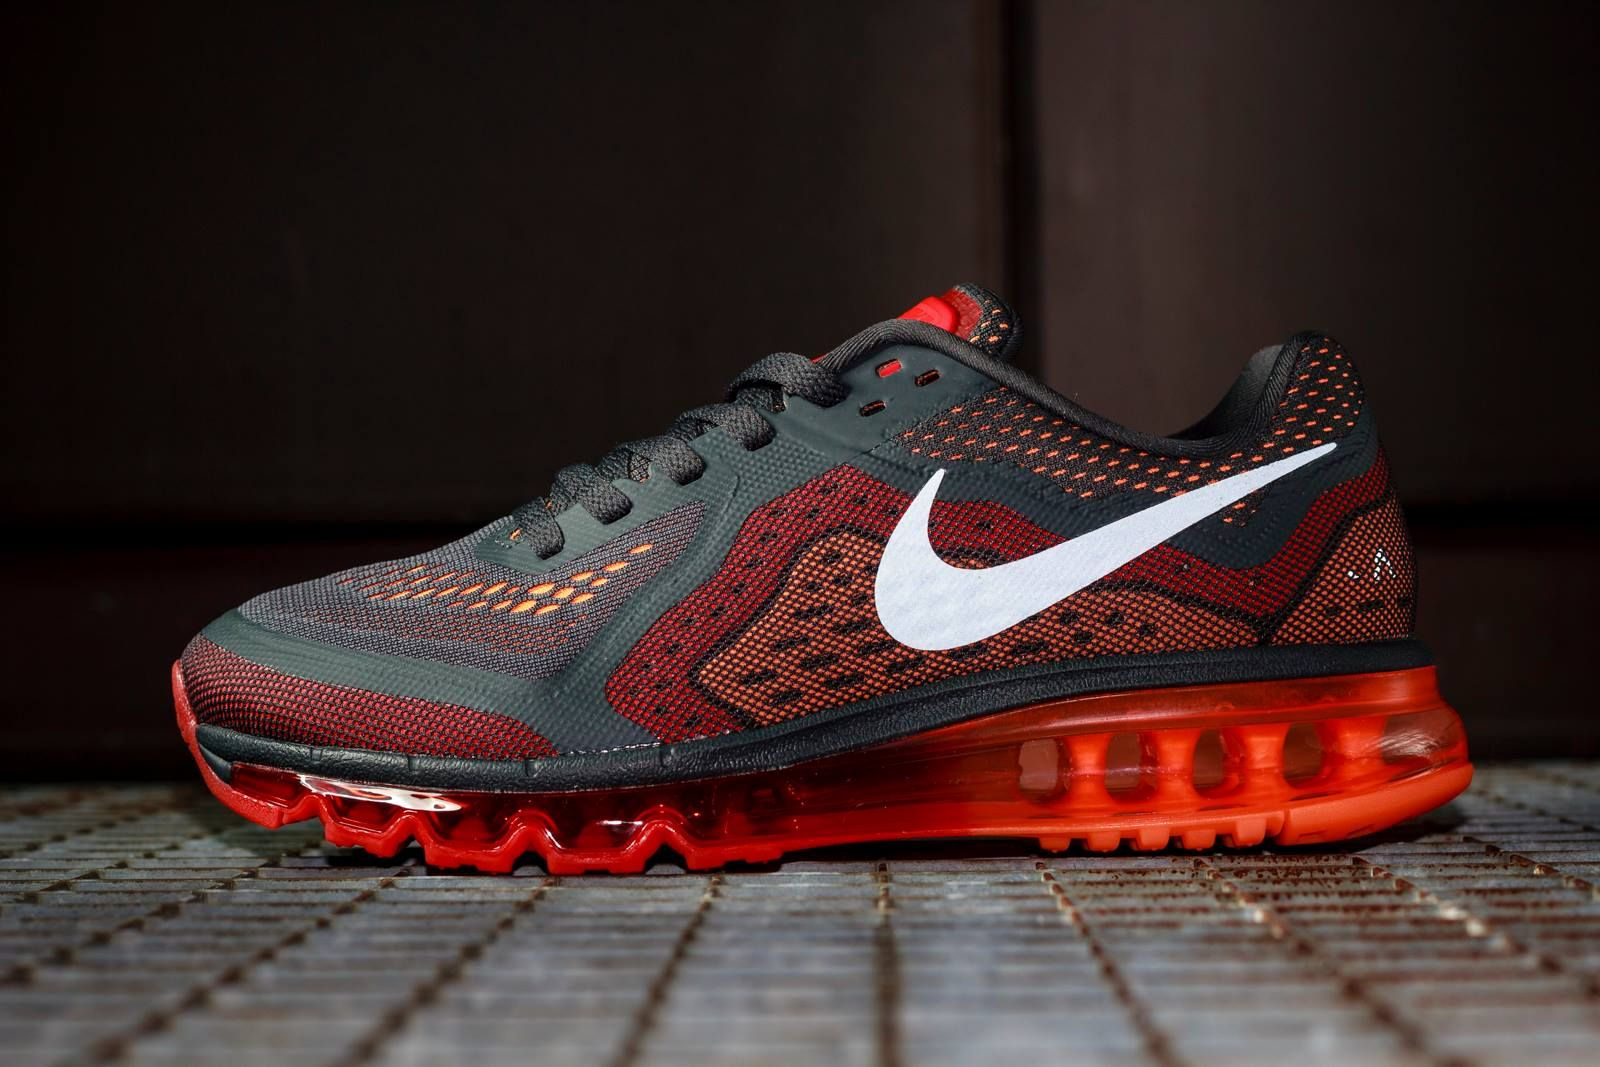 Nike Air Max 2014 | Nike shoes, Shoes, Sneakers nike